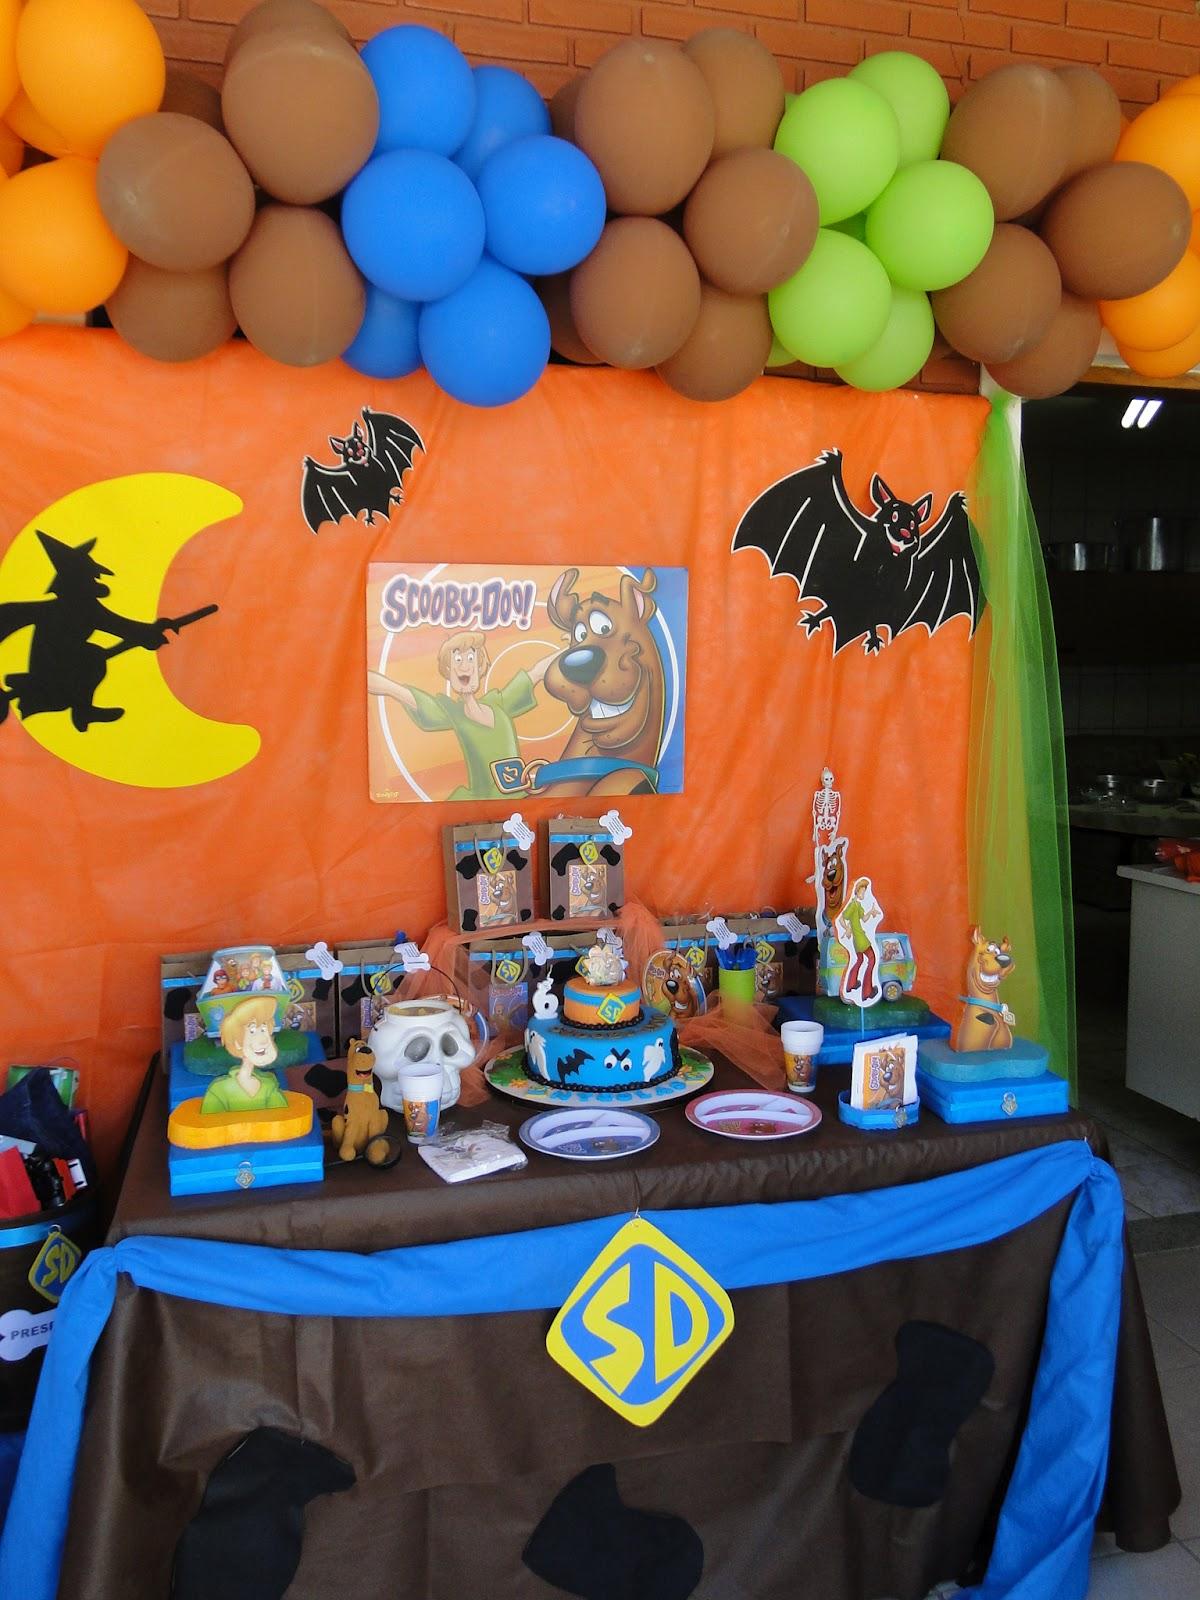 Preparando aula scooby doo festa de anivers rio infantil - De scooby doo ...